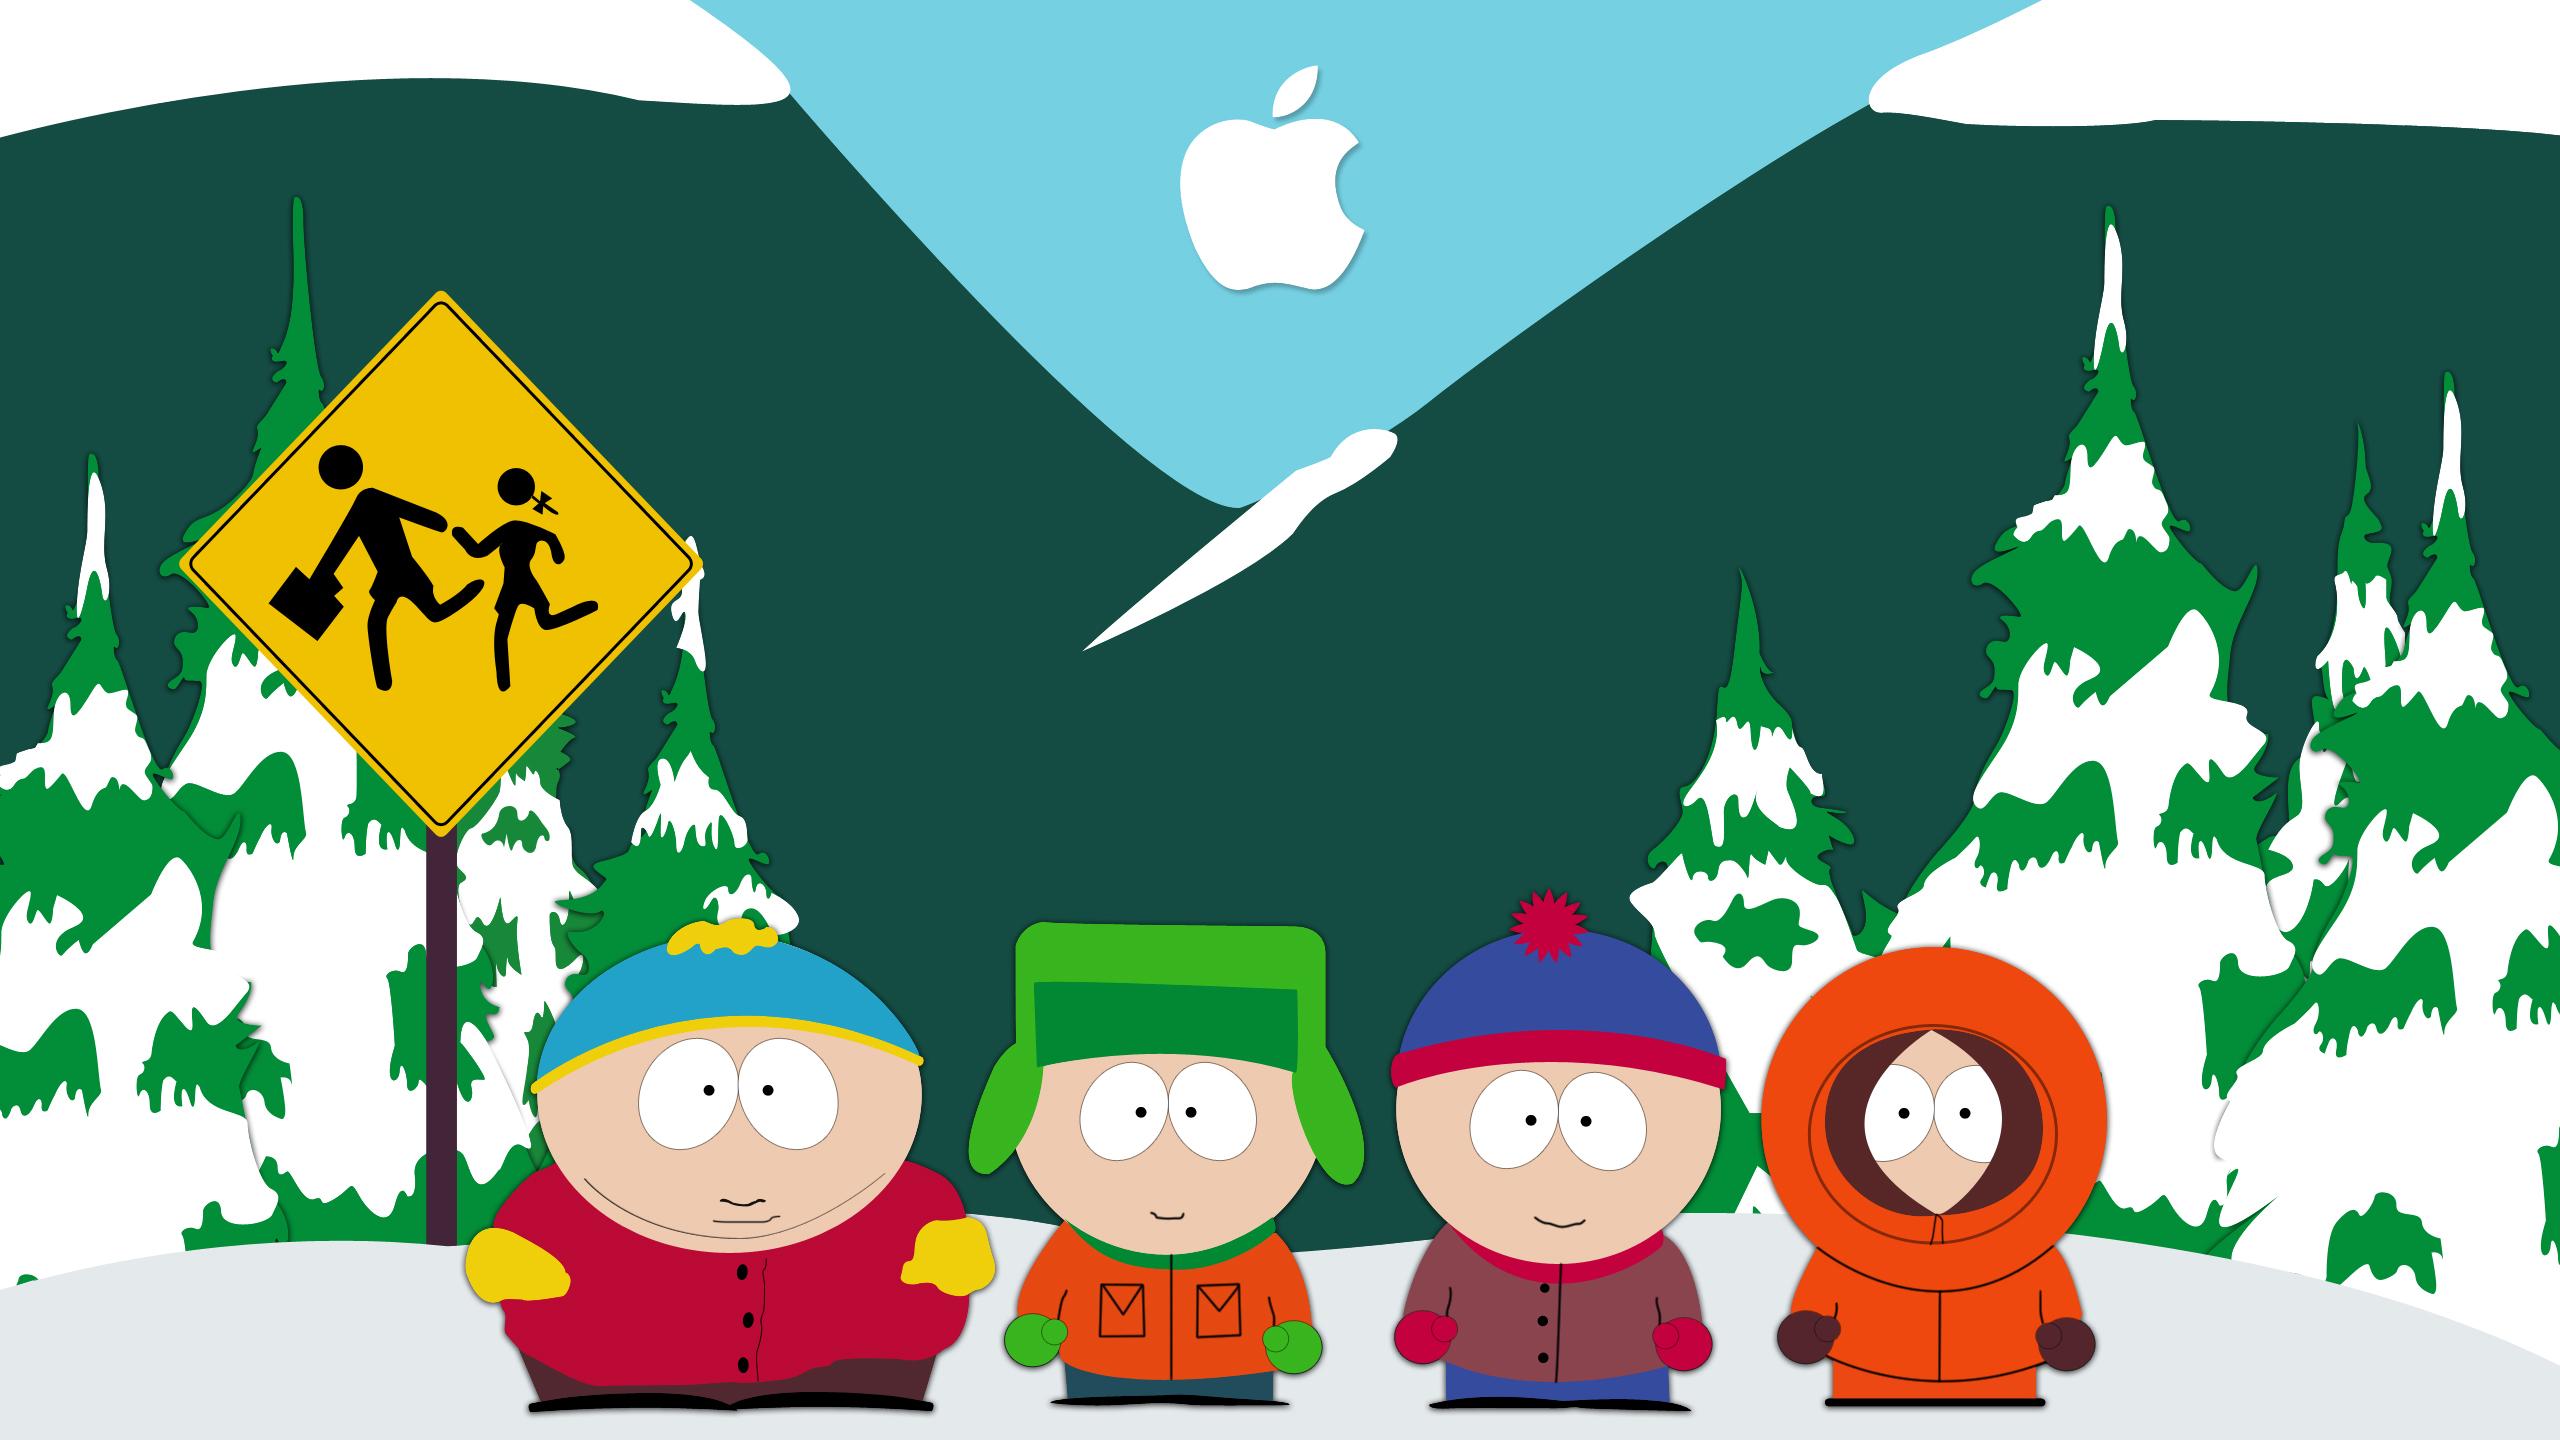 South Park Wallpaper Full Desktop Backgrounds 2560x1440